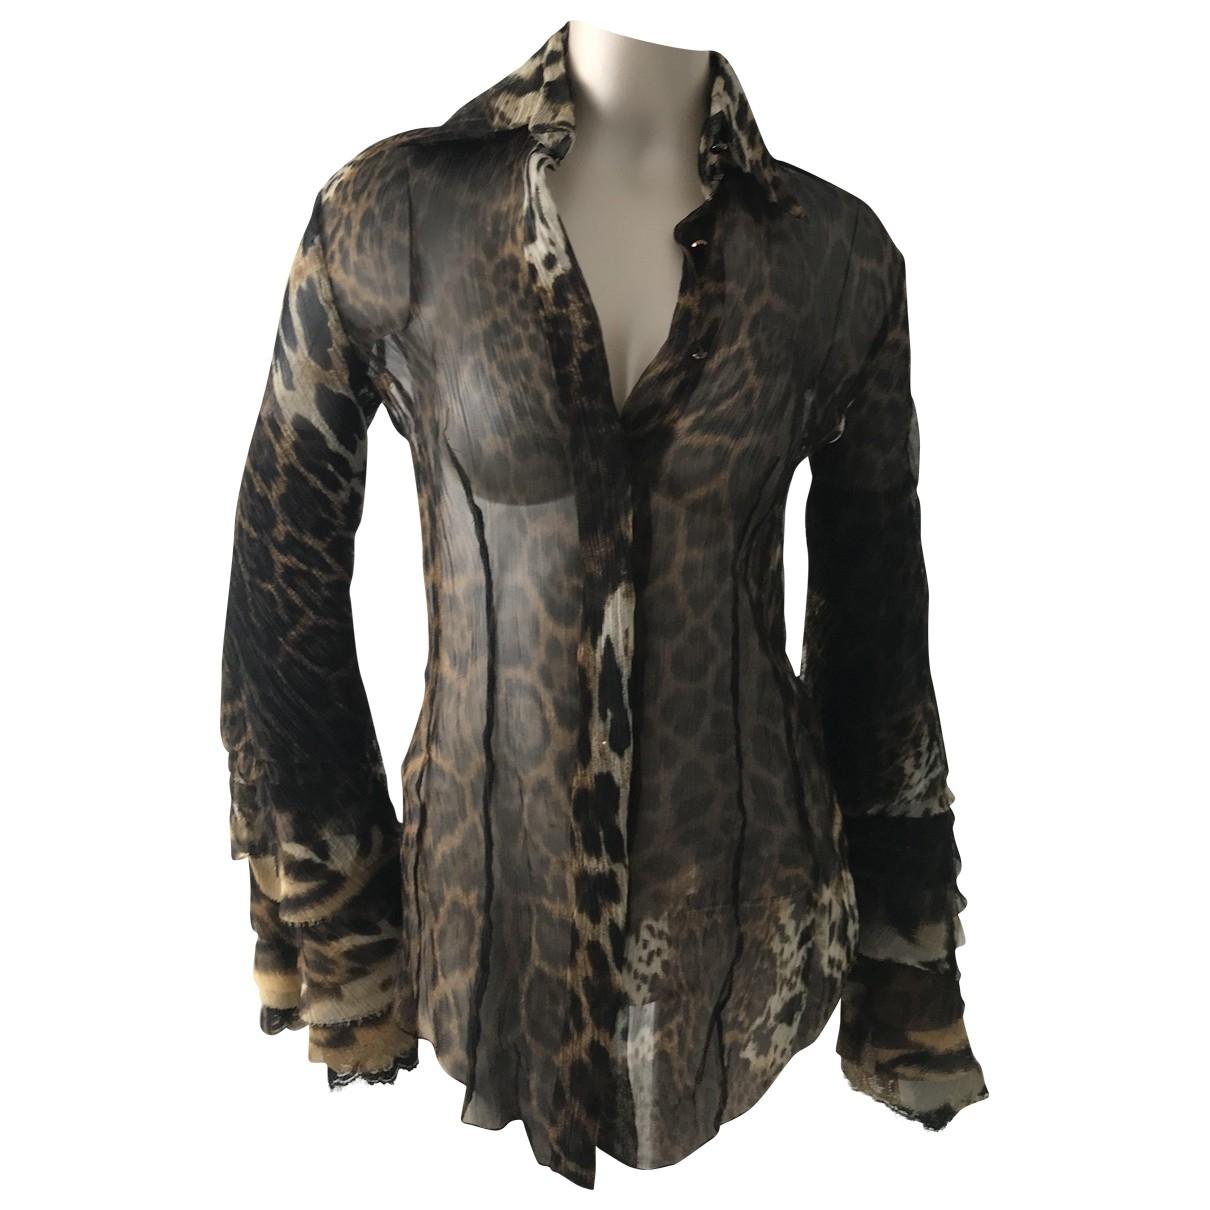 Gianfranco Ferré \N Brown Silk  top for Women 38 IT